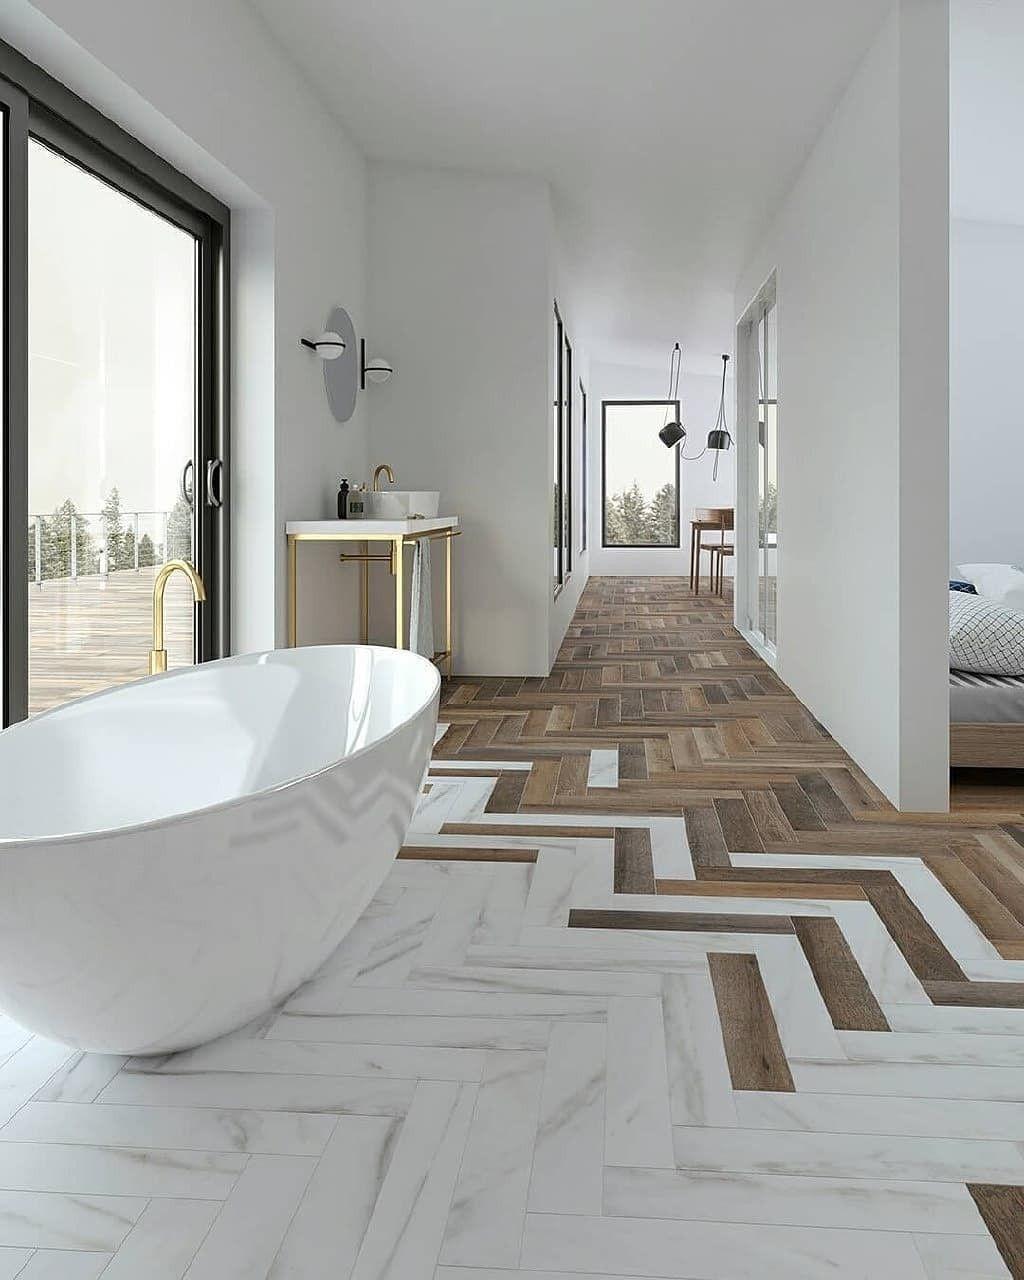 Photo of Moderne luksuriøst badekar med ekstraordinære fliser